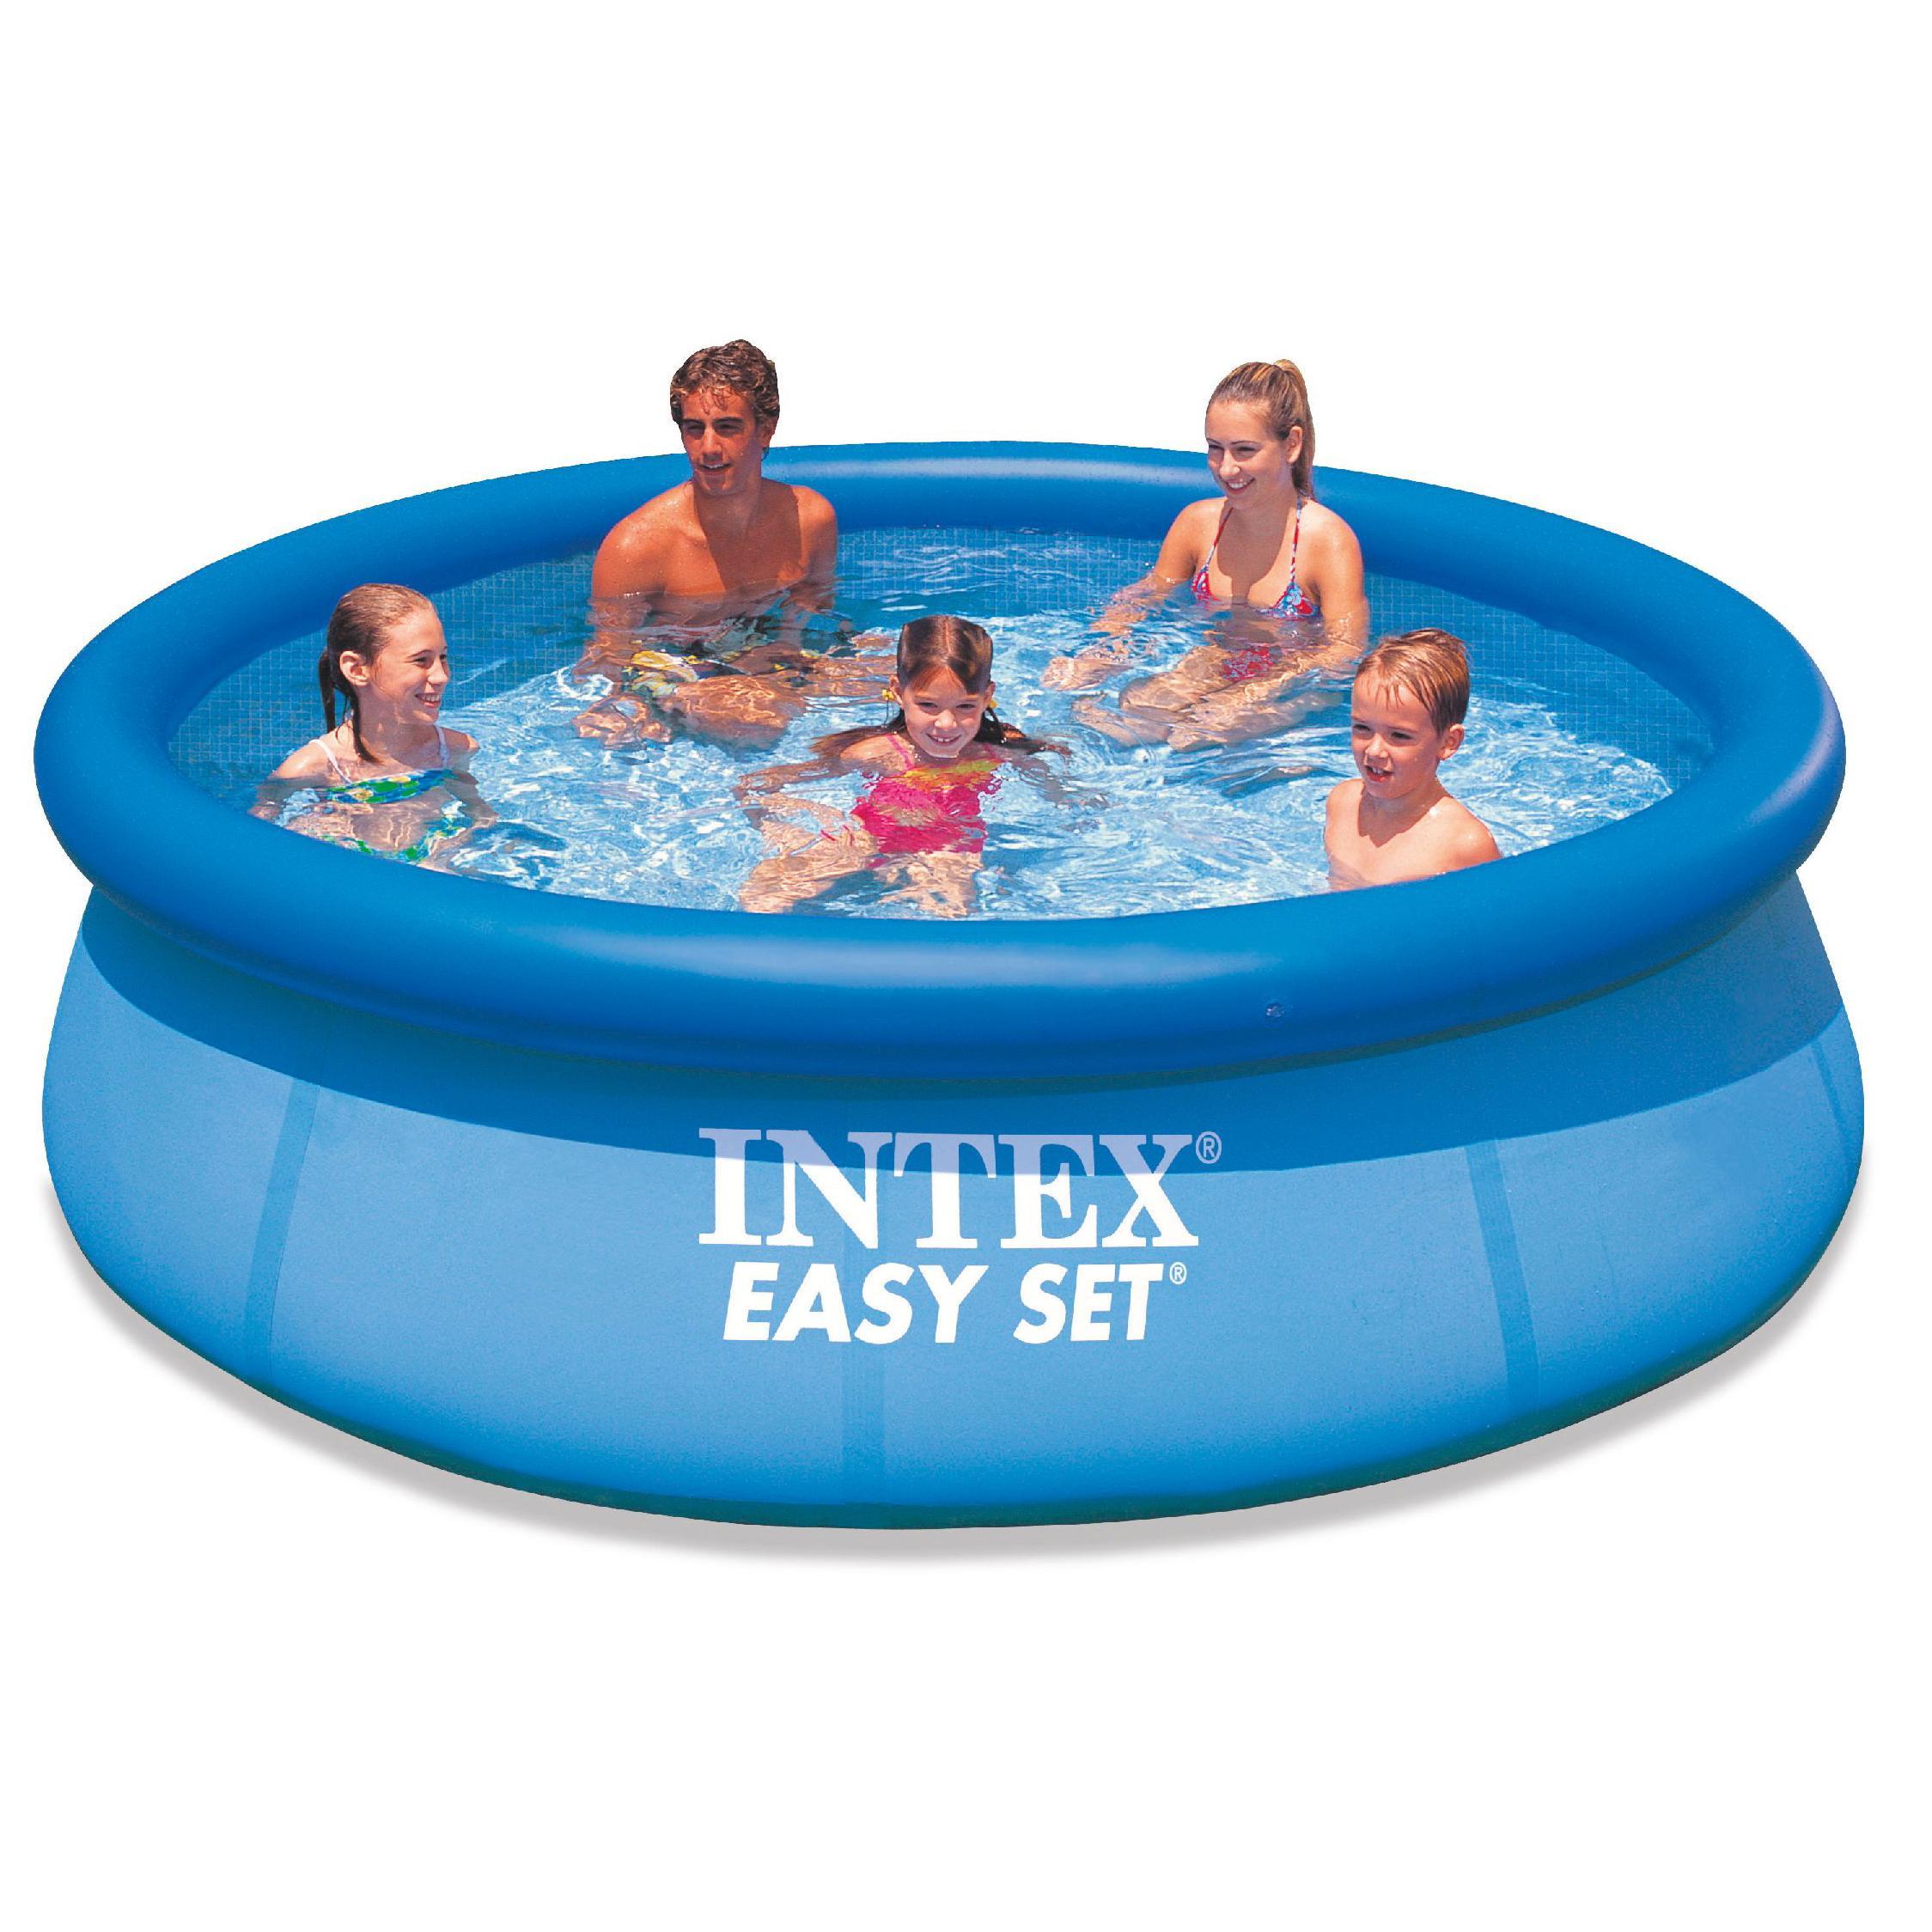 Net price direct cheap children baby kids toys party - Piscine autoportante intex easy set ...